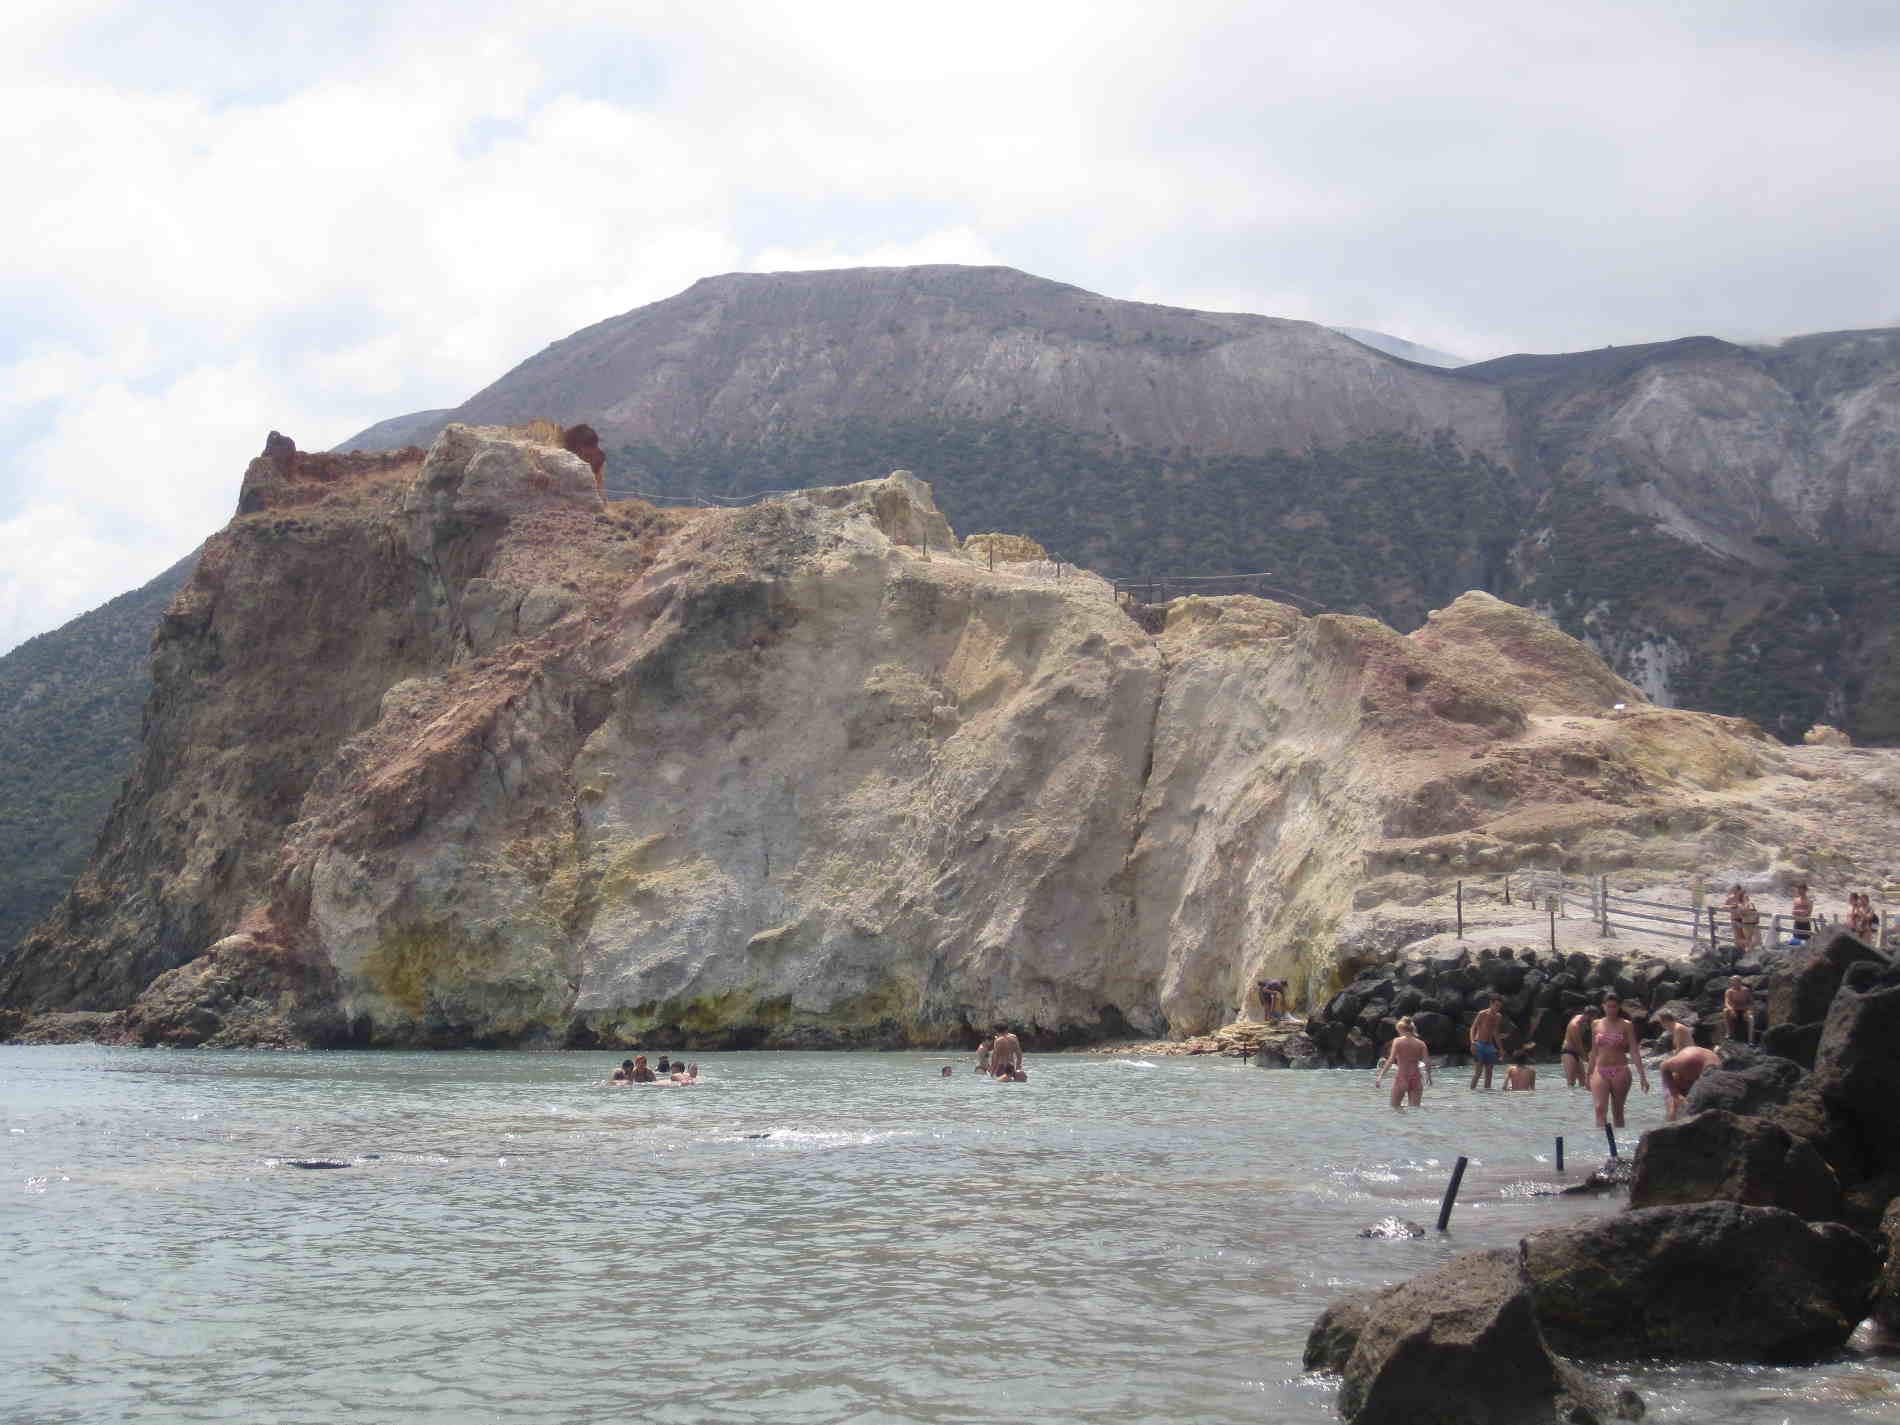 Fanghi e Bagni a Vulcano Isole Eolie